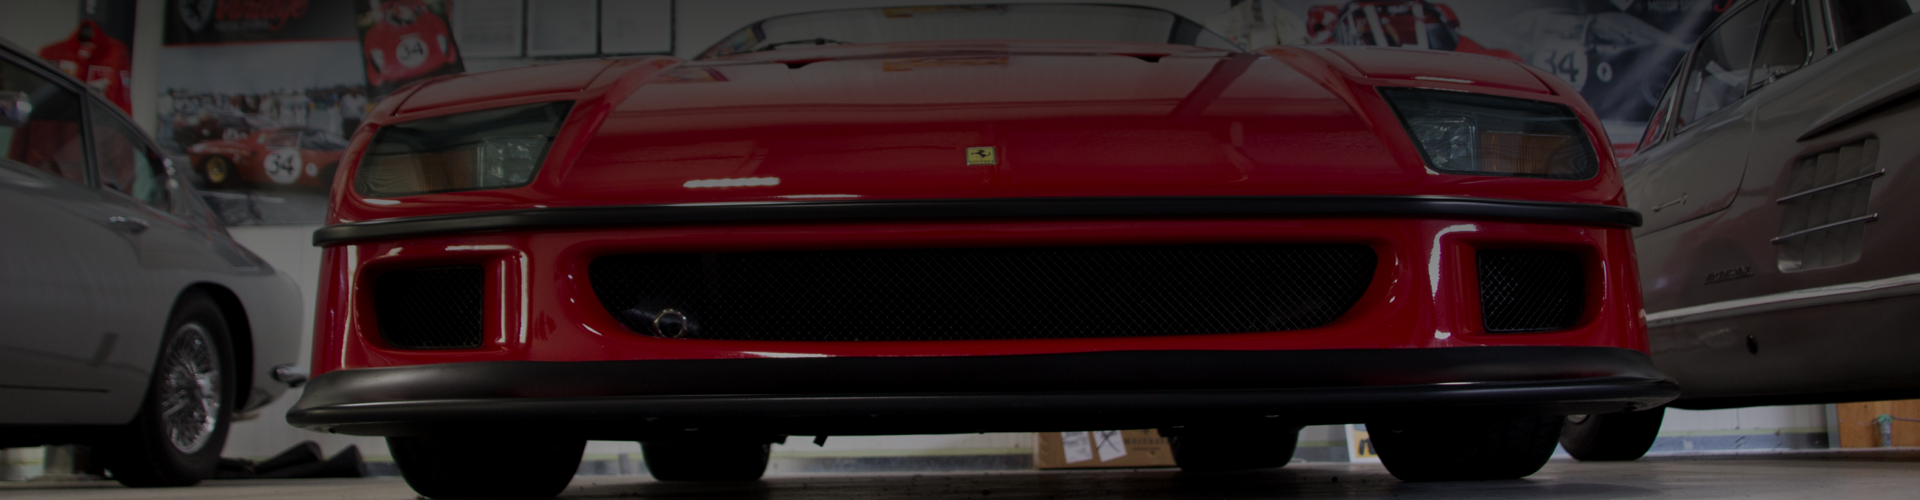 Ferrari as seen from ground level